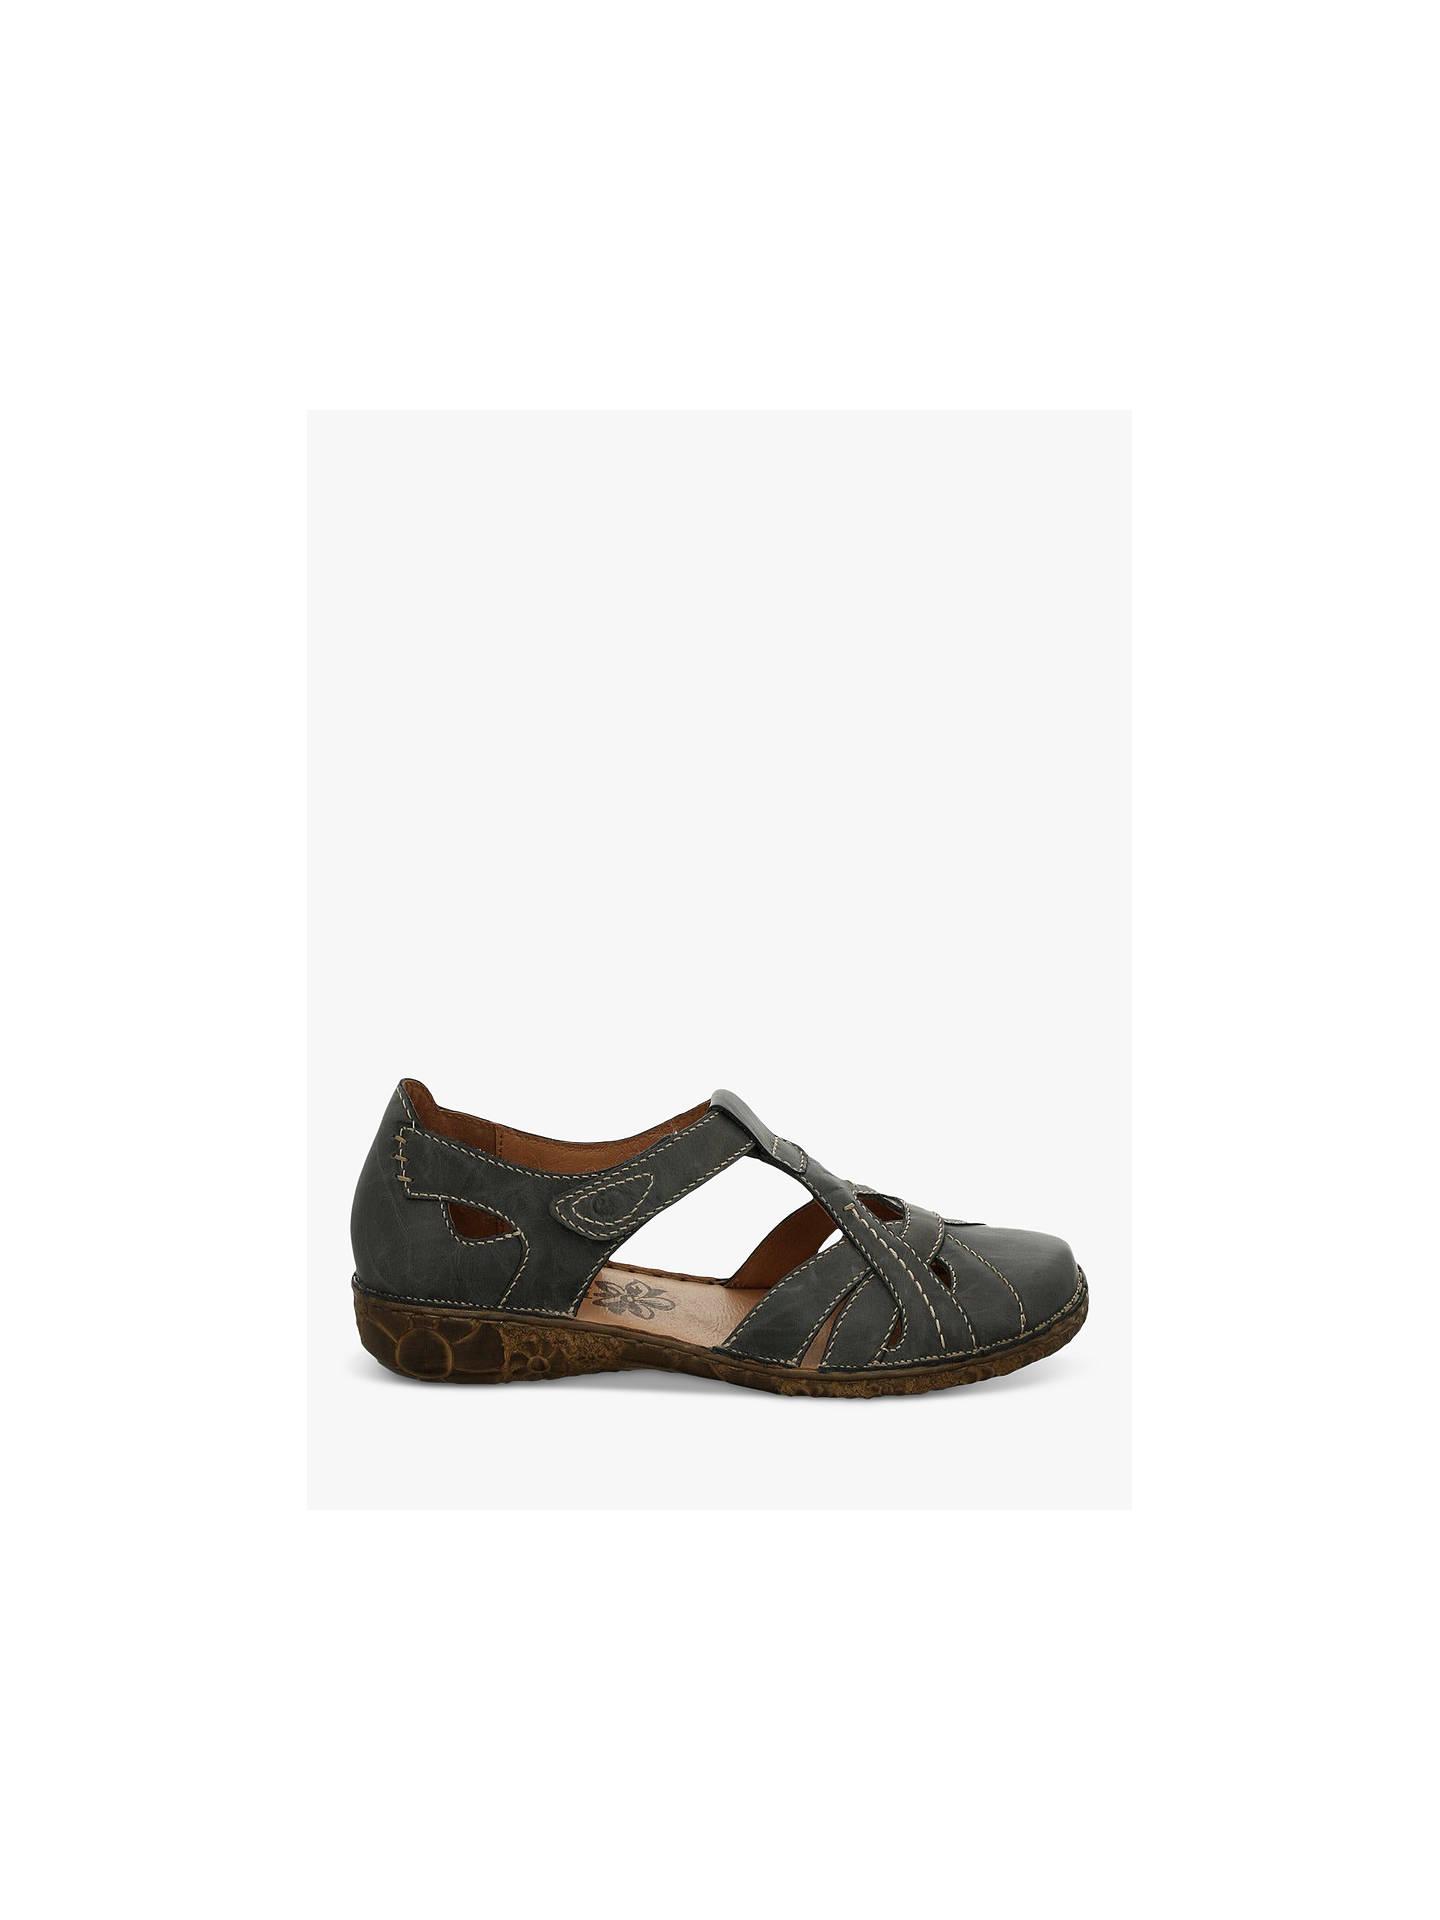 22e9888509b Buy Josef Seibel Rosalie 29 Two Part T-Bar Casual Shoes